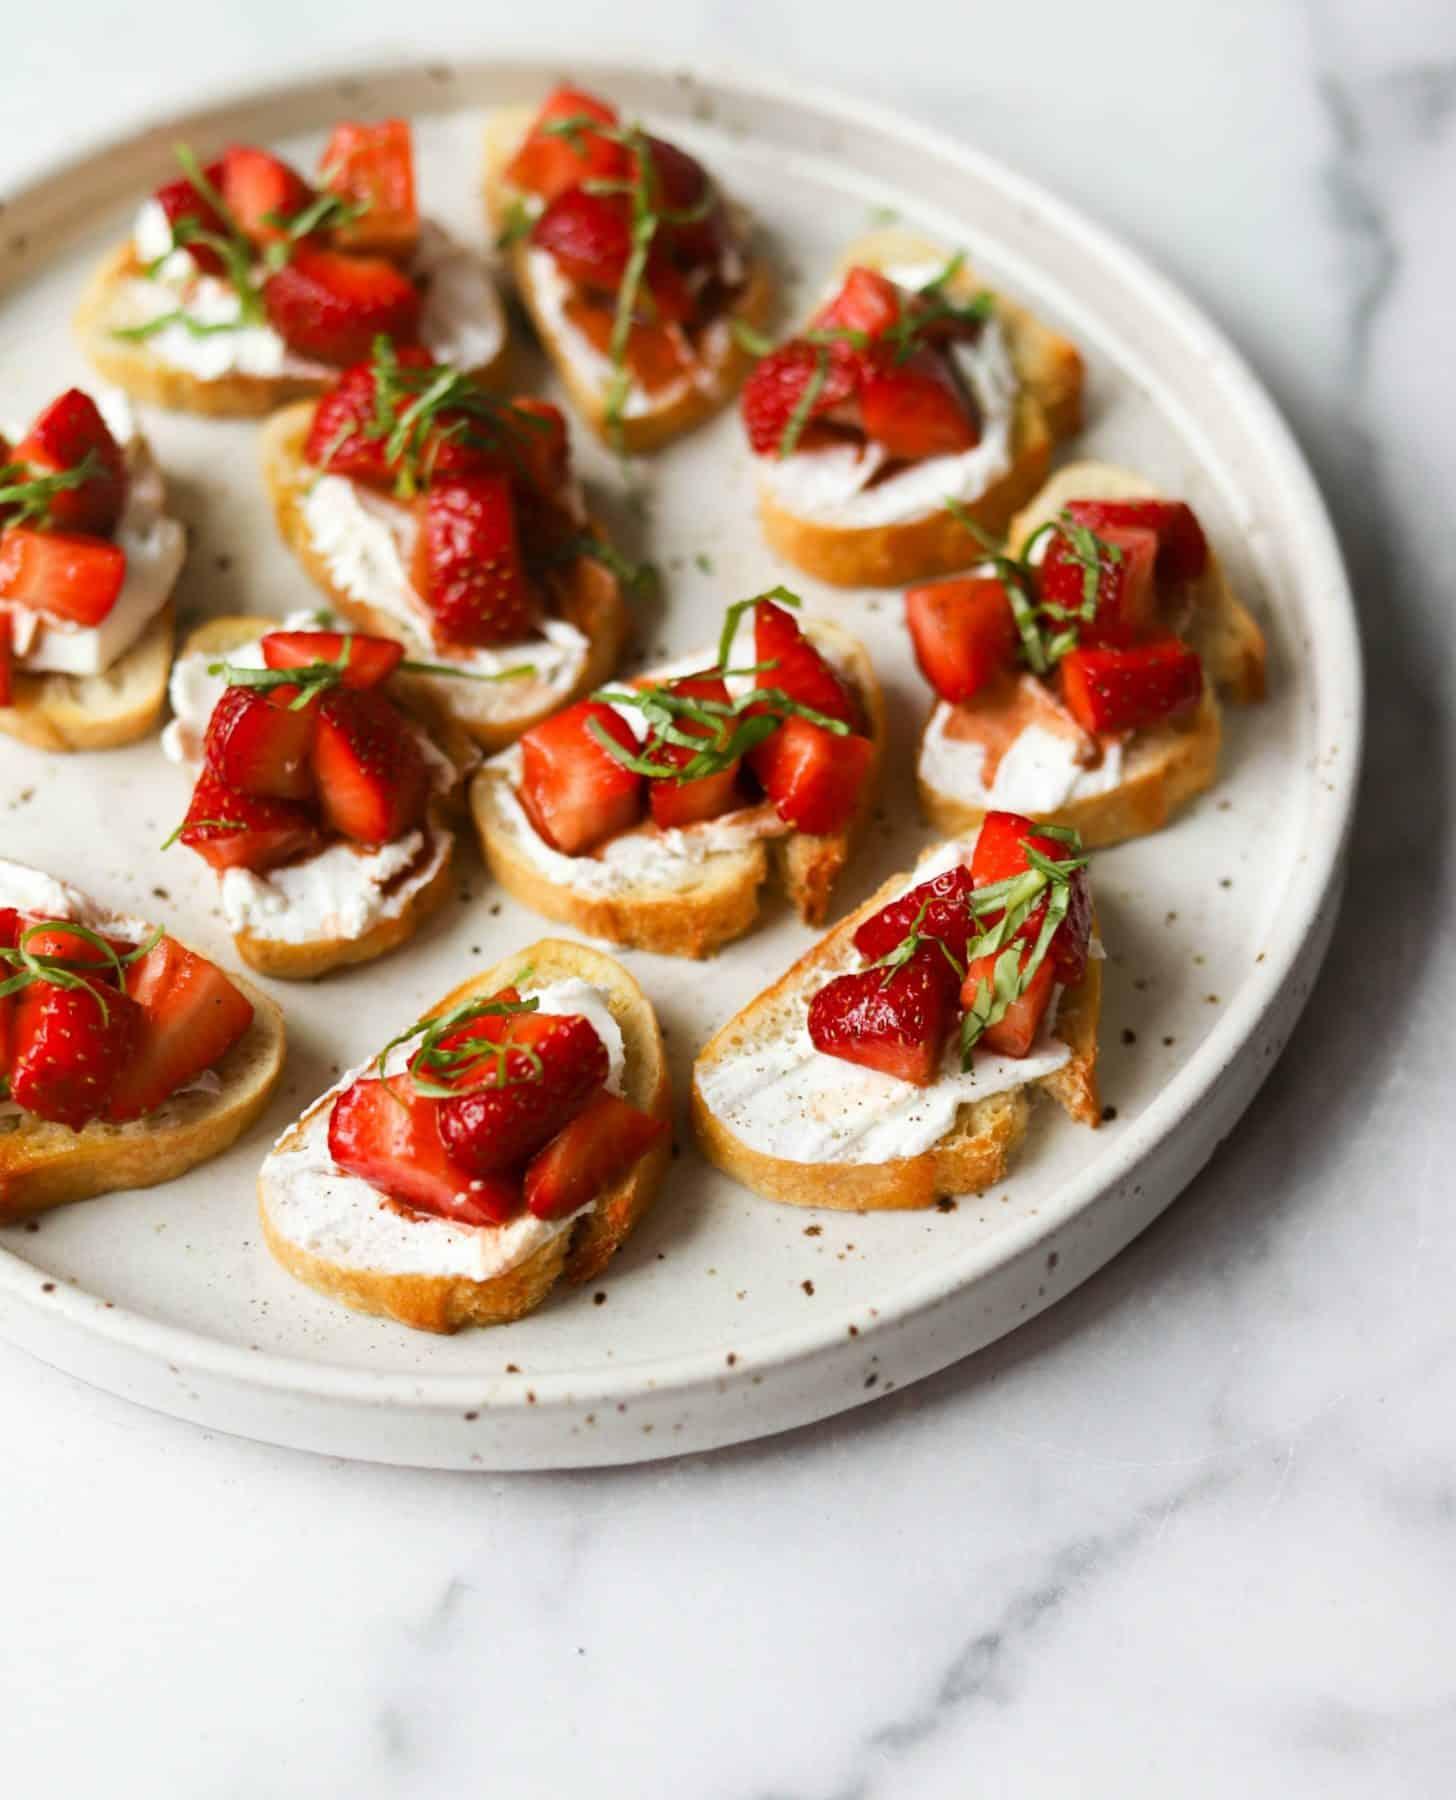 Strawberry basil bruschetta on a white plate